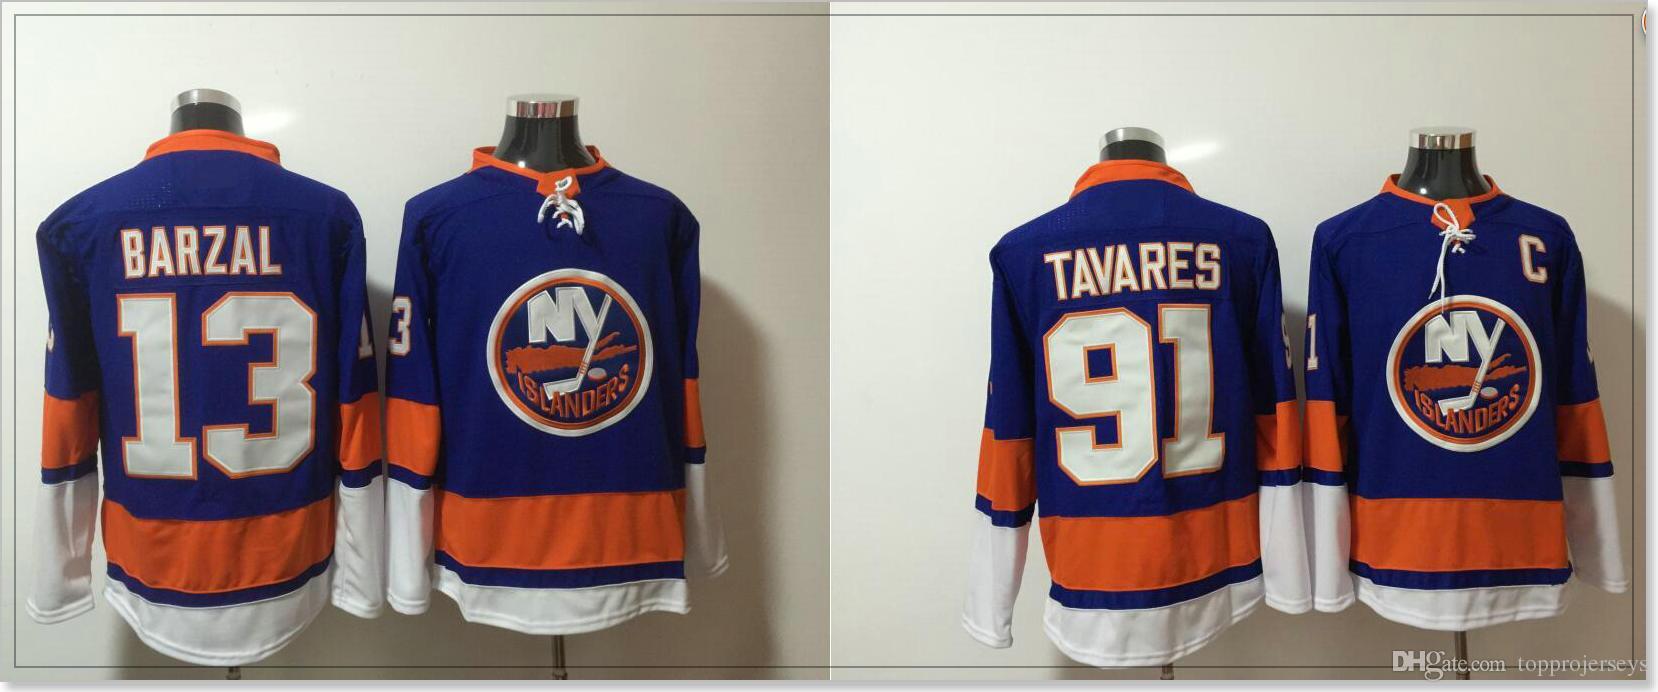 New York Islanders #91 John Tavares 13 Mathew Barzal Vintage Mens Ice Hockey Uniforms Shirts Sports Team Cheap Jerseys Stitched Embroidery